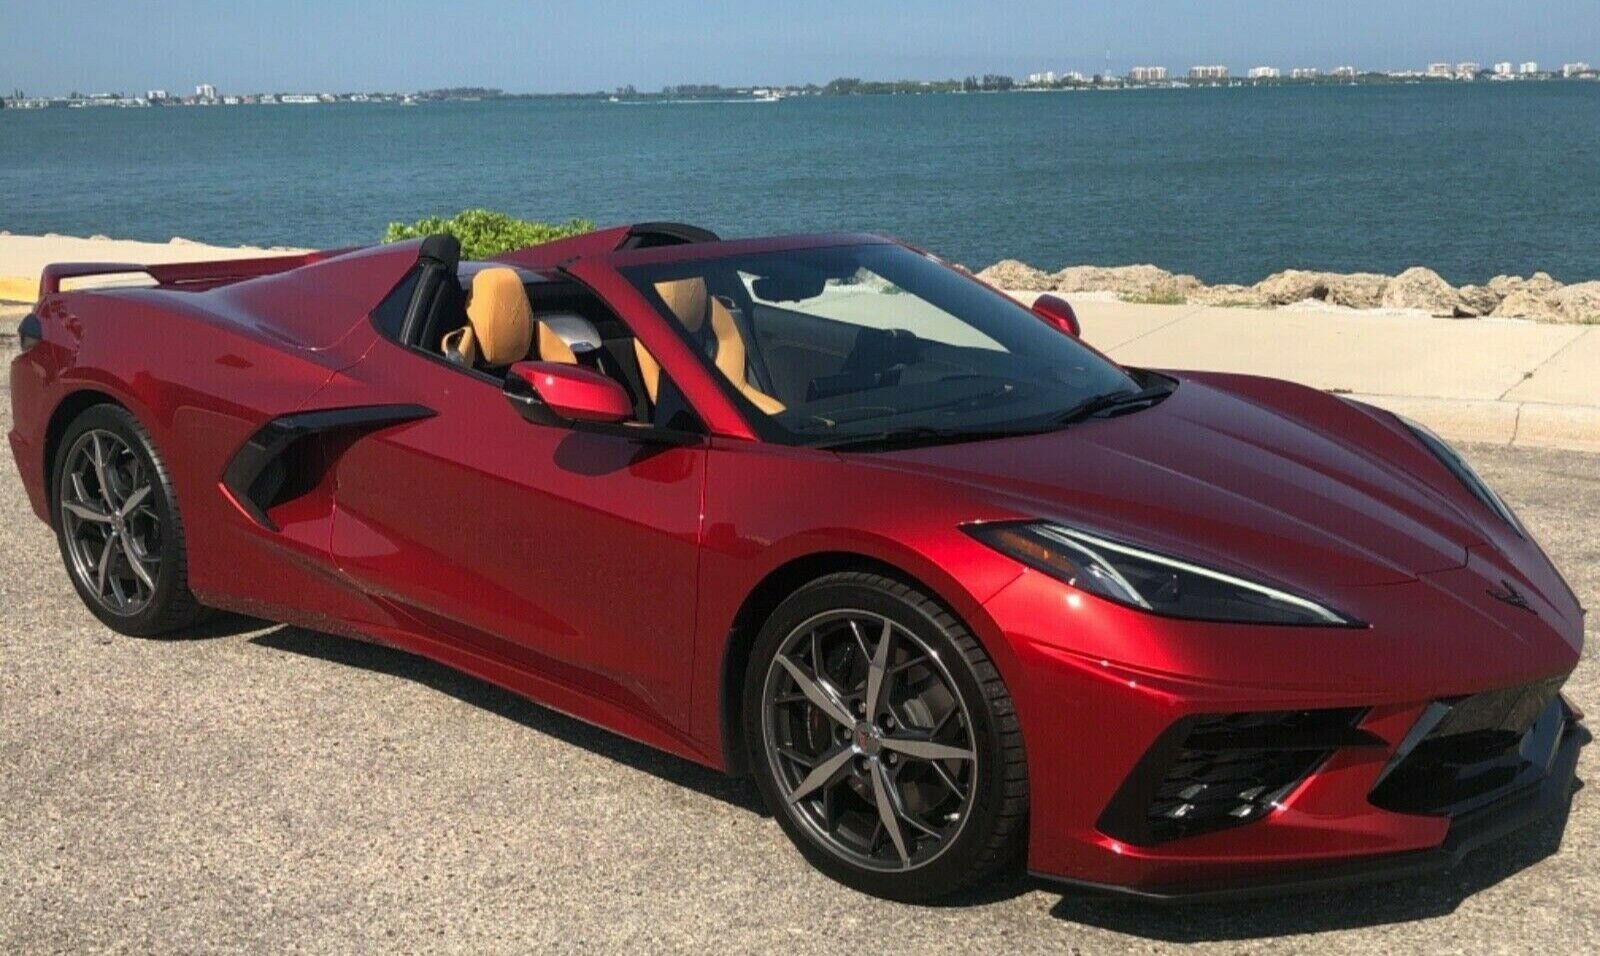 2021 Red Mist Metallic Tintcoat Chevrolet Corvette   | C7 Corvette Photo 1